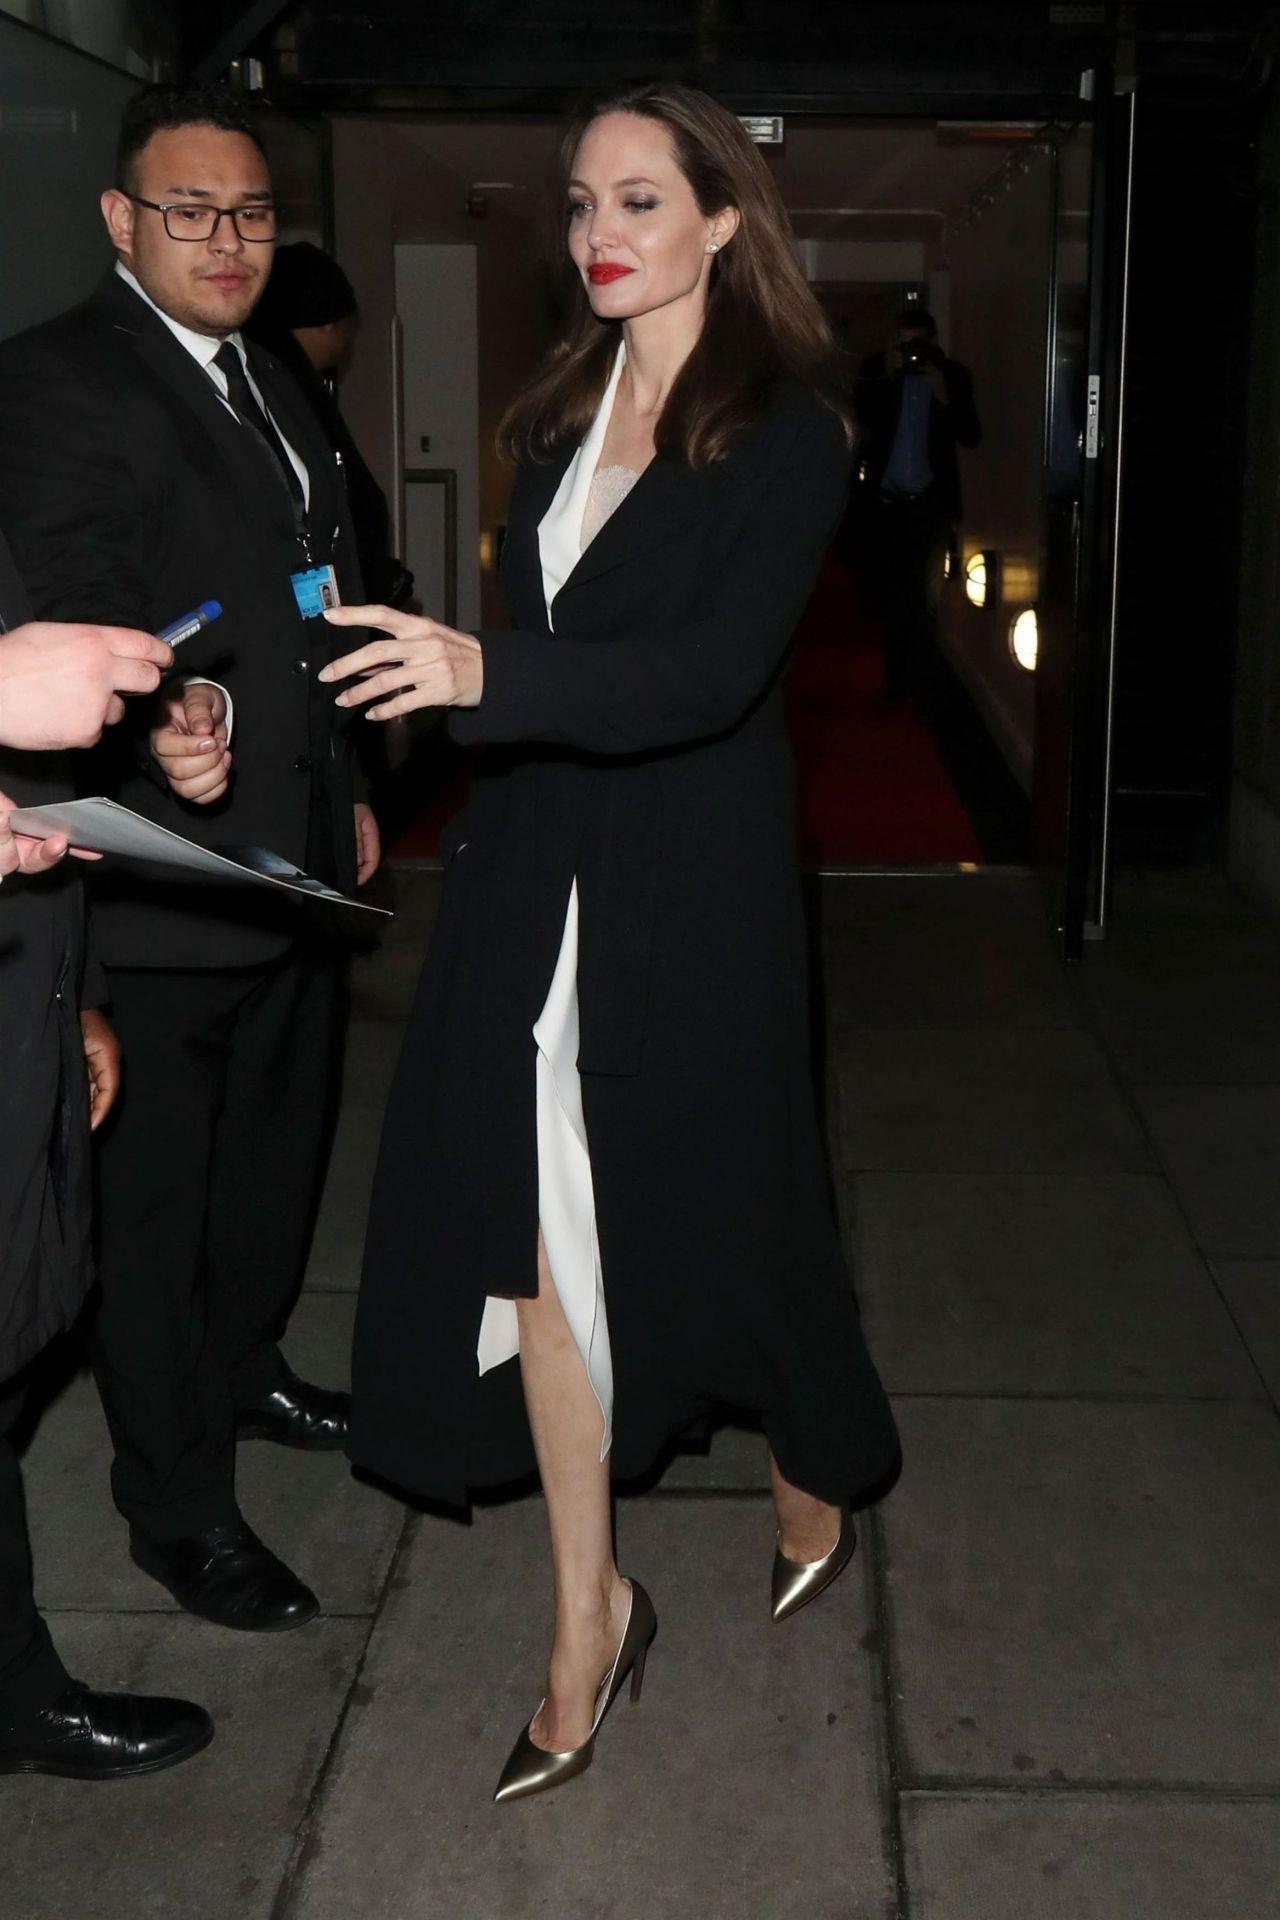 https://celebmafia.com/wp-content/uploads/2018/11/angelina-jolie-leaving-the-british-film-institut-in-london-11-23-2018-1.jpg